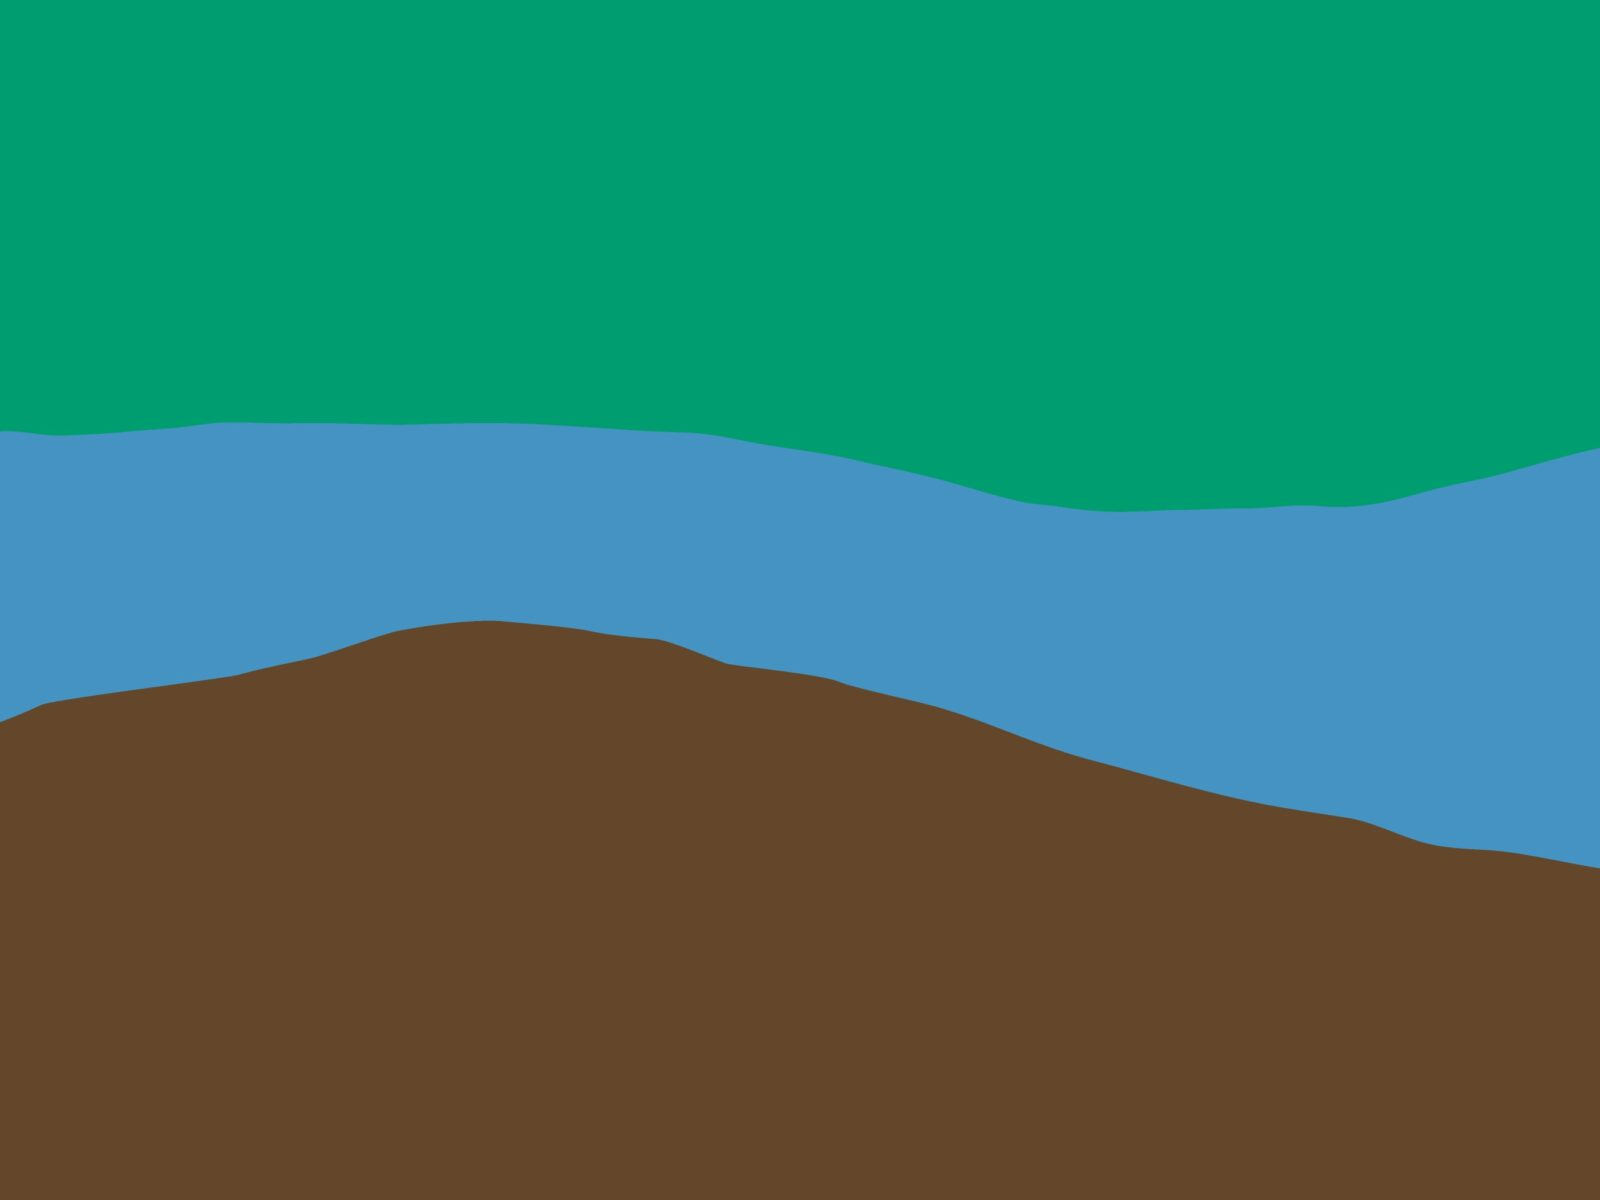 https://www.patagonia.jp/blog/wp-content/uploads/2021/10/blog_cover01.jpg